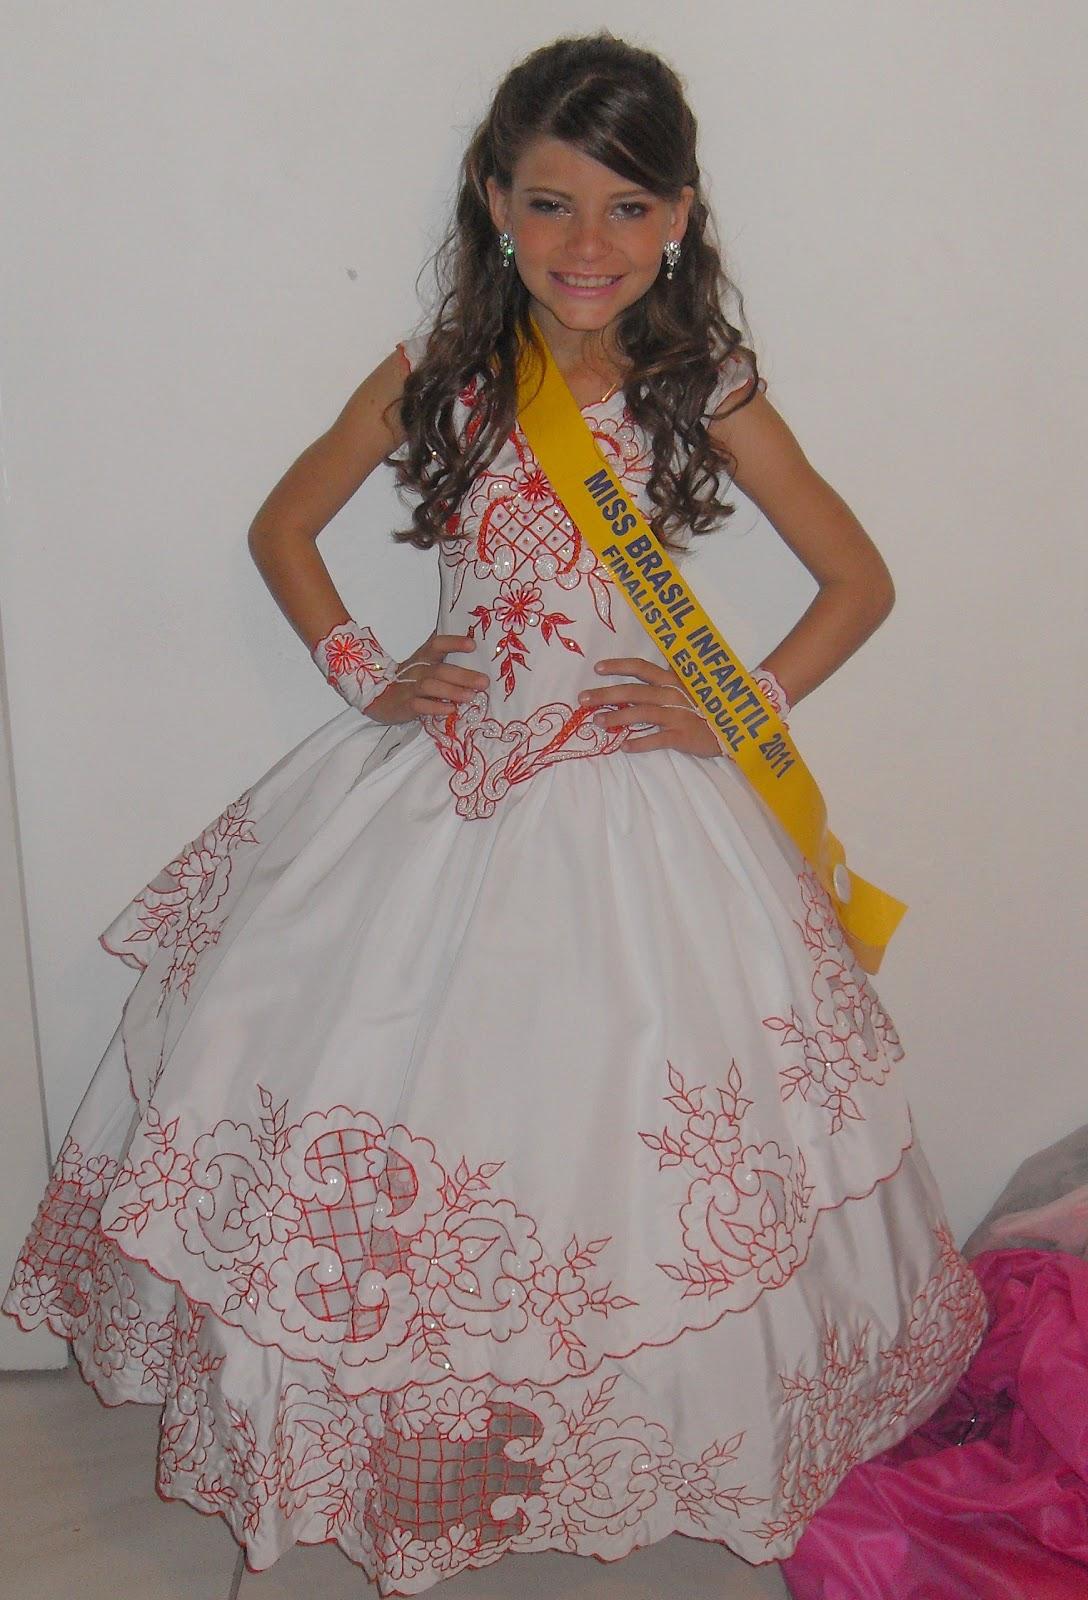 http://2.bp.blogspot.com/-nZxcdb-52xk/Tj4FjXqsOsI/AAAAAAAAAL4/7ikdAzvqMoc/s1600/lara+vestido+cantinho+das+noivas.JPG